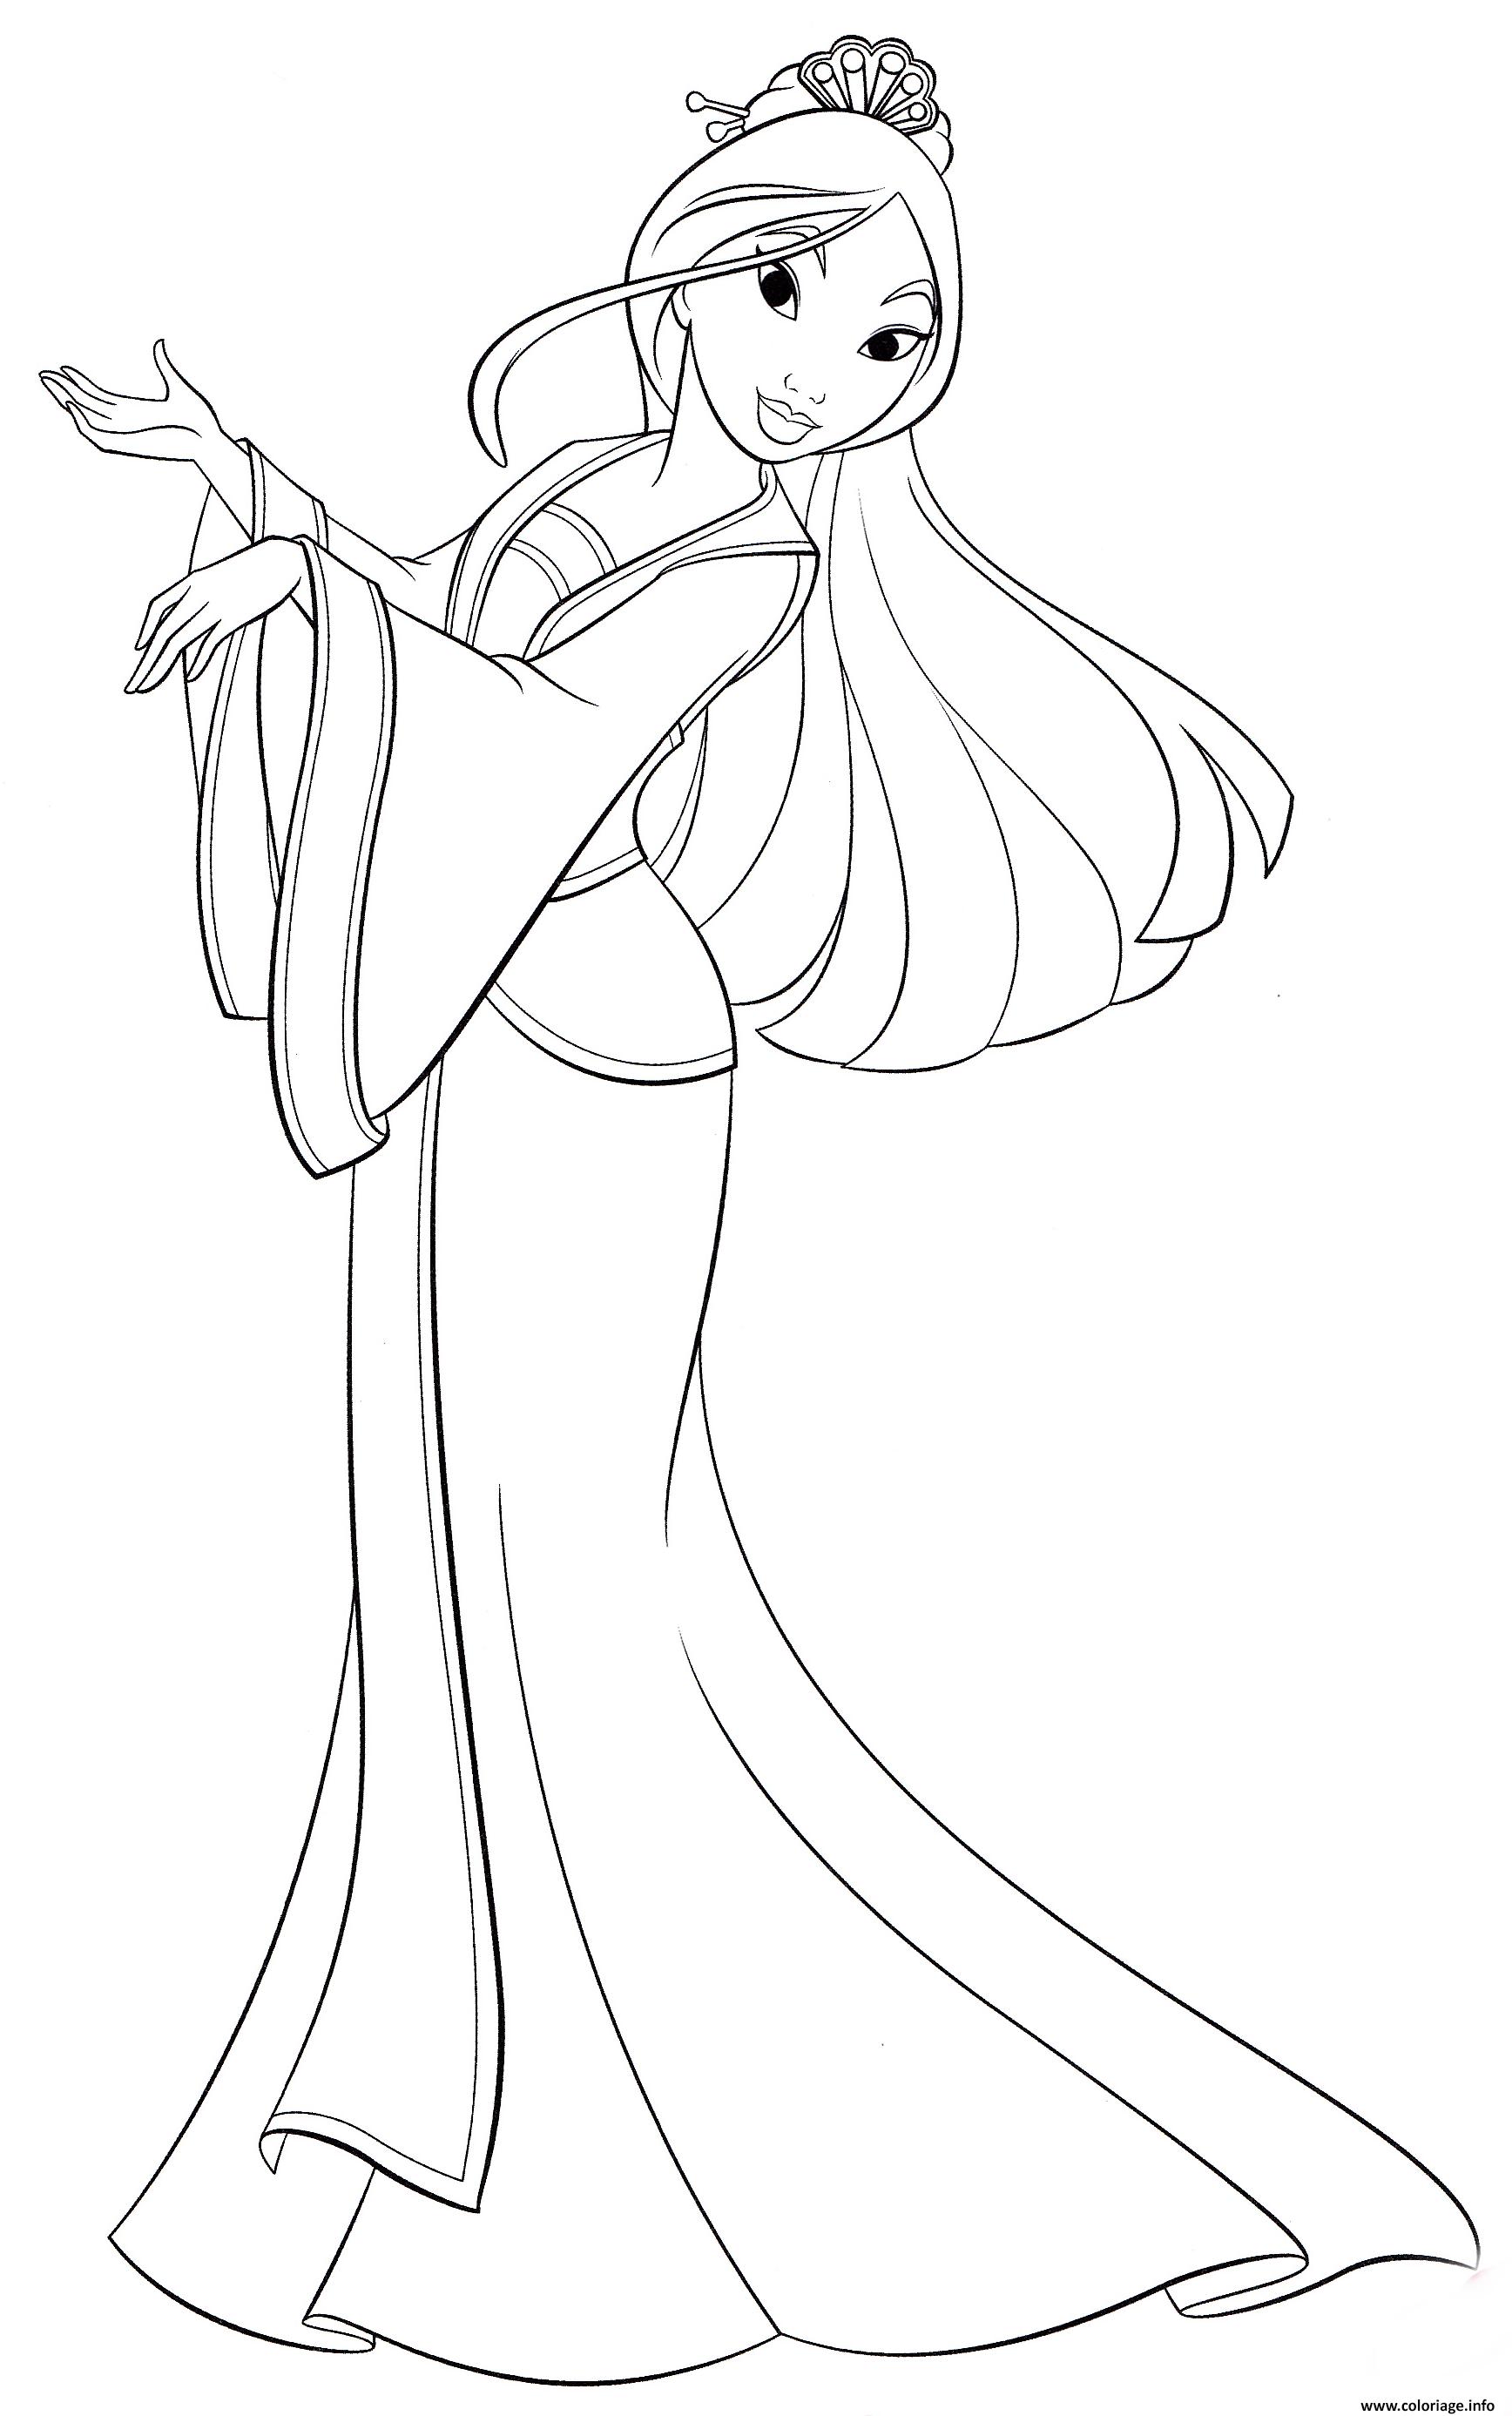 Coloriage Princesse Disney Mulan Legende Chinoise De Fa Mulan Jecolorie Com